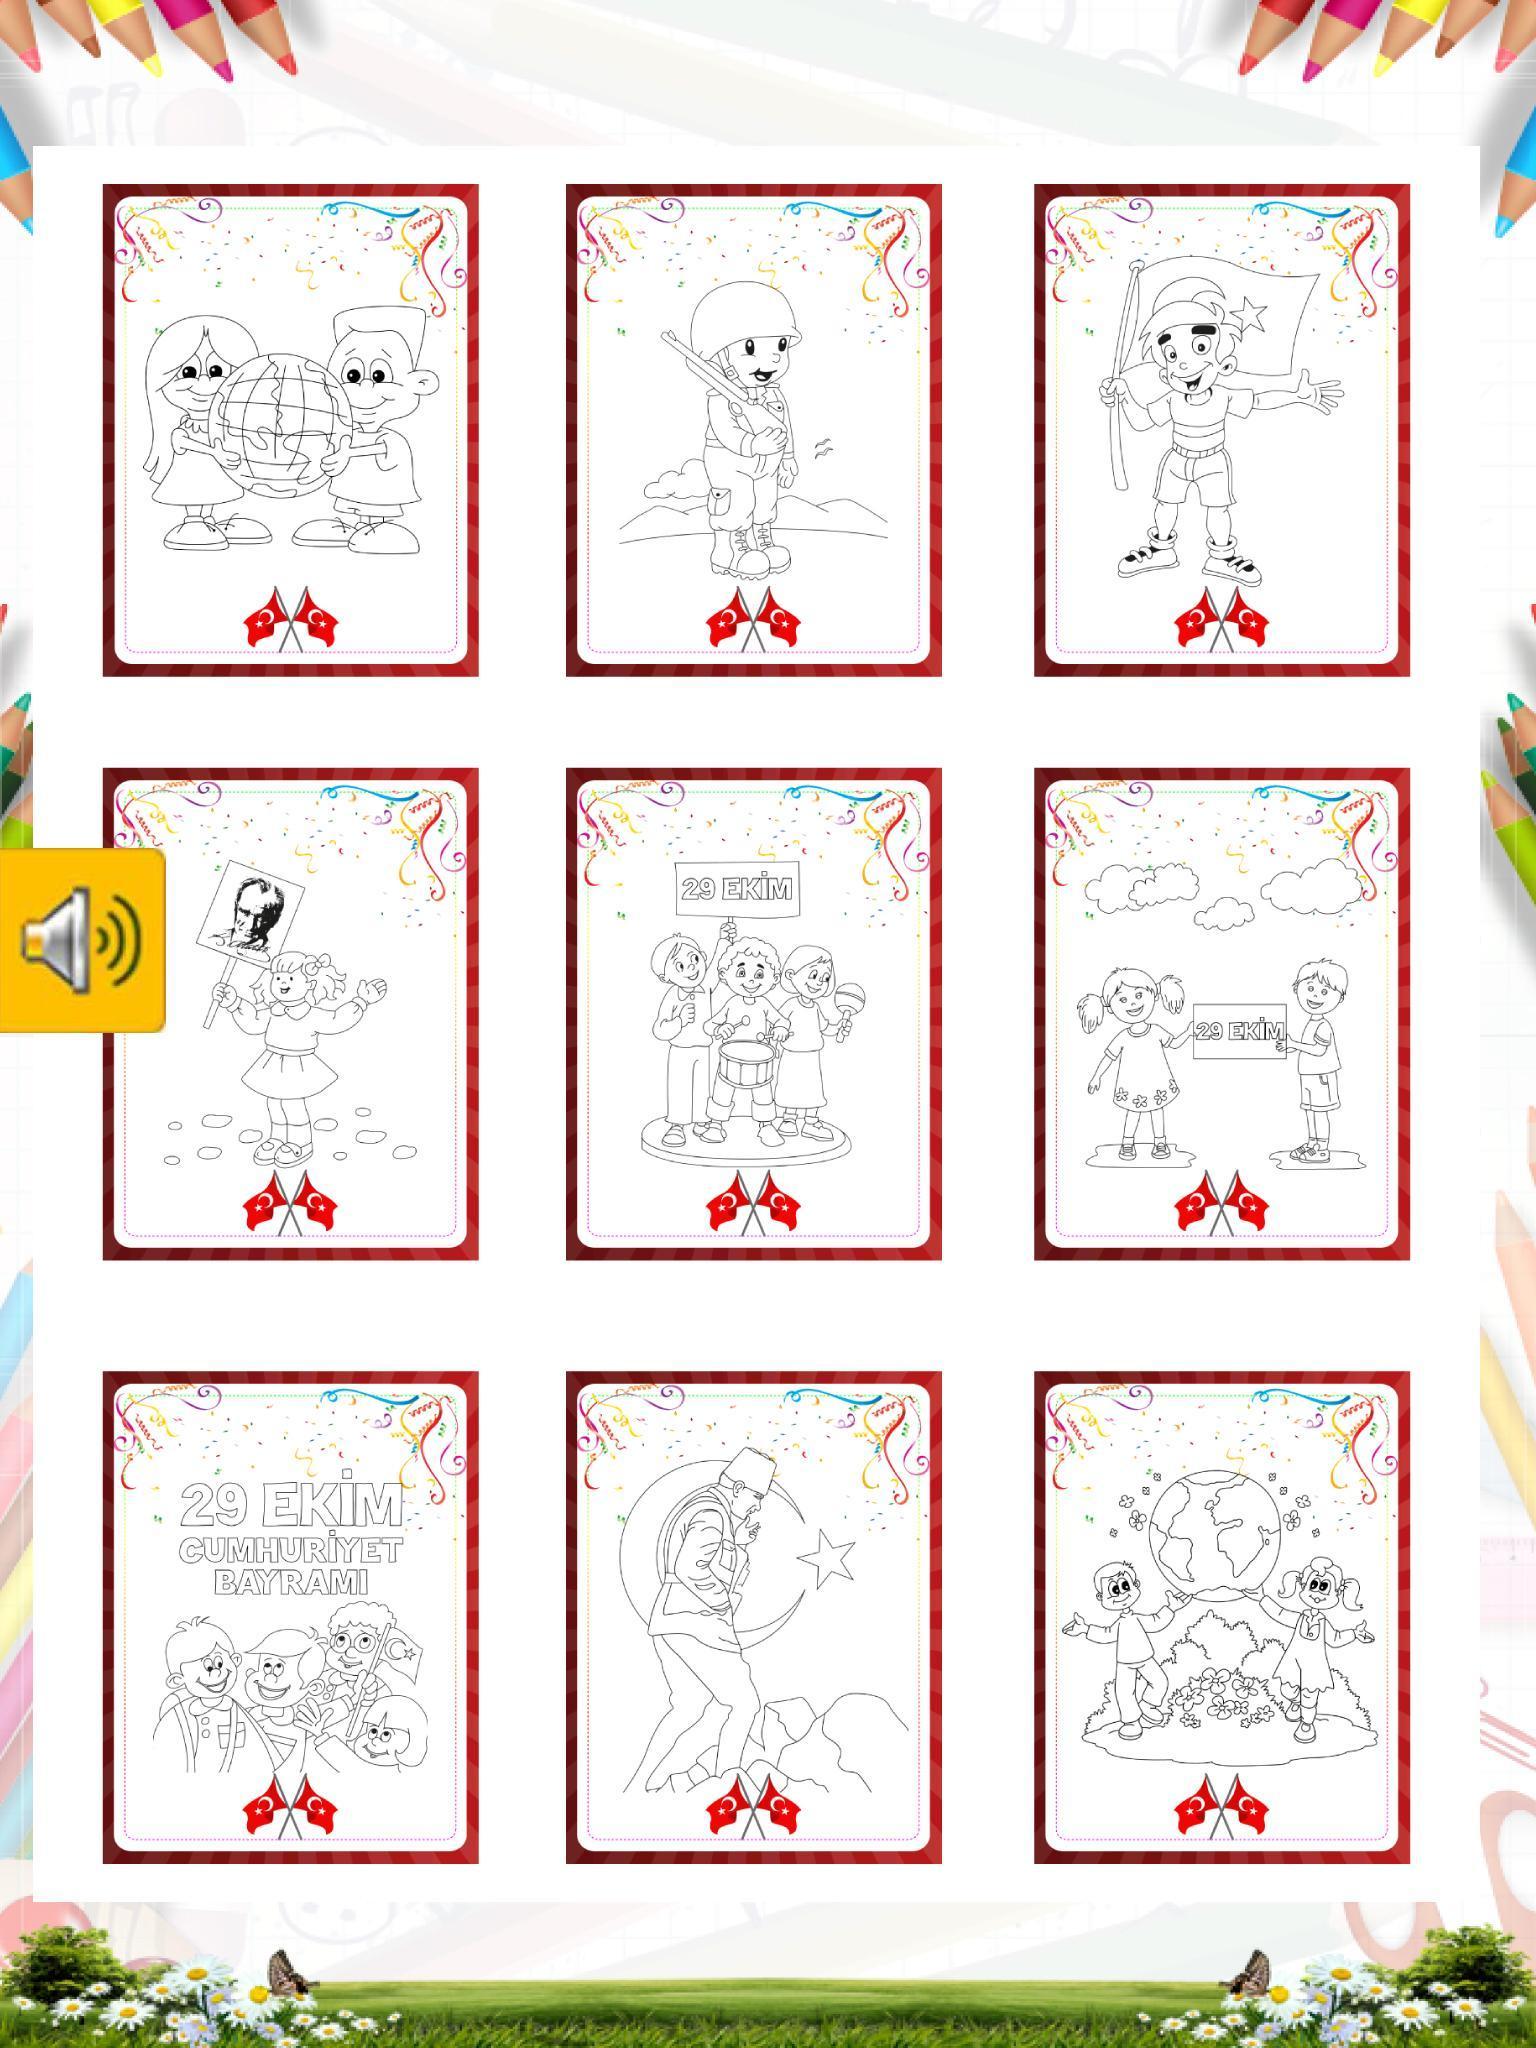 29 Ekim Boyama Kitabi Unreleased For Android Apk Download